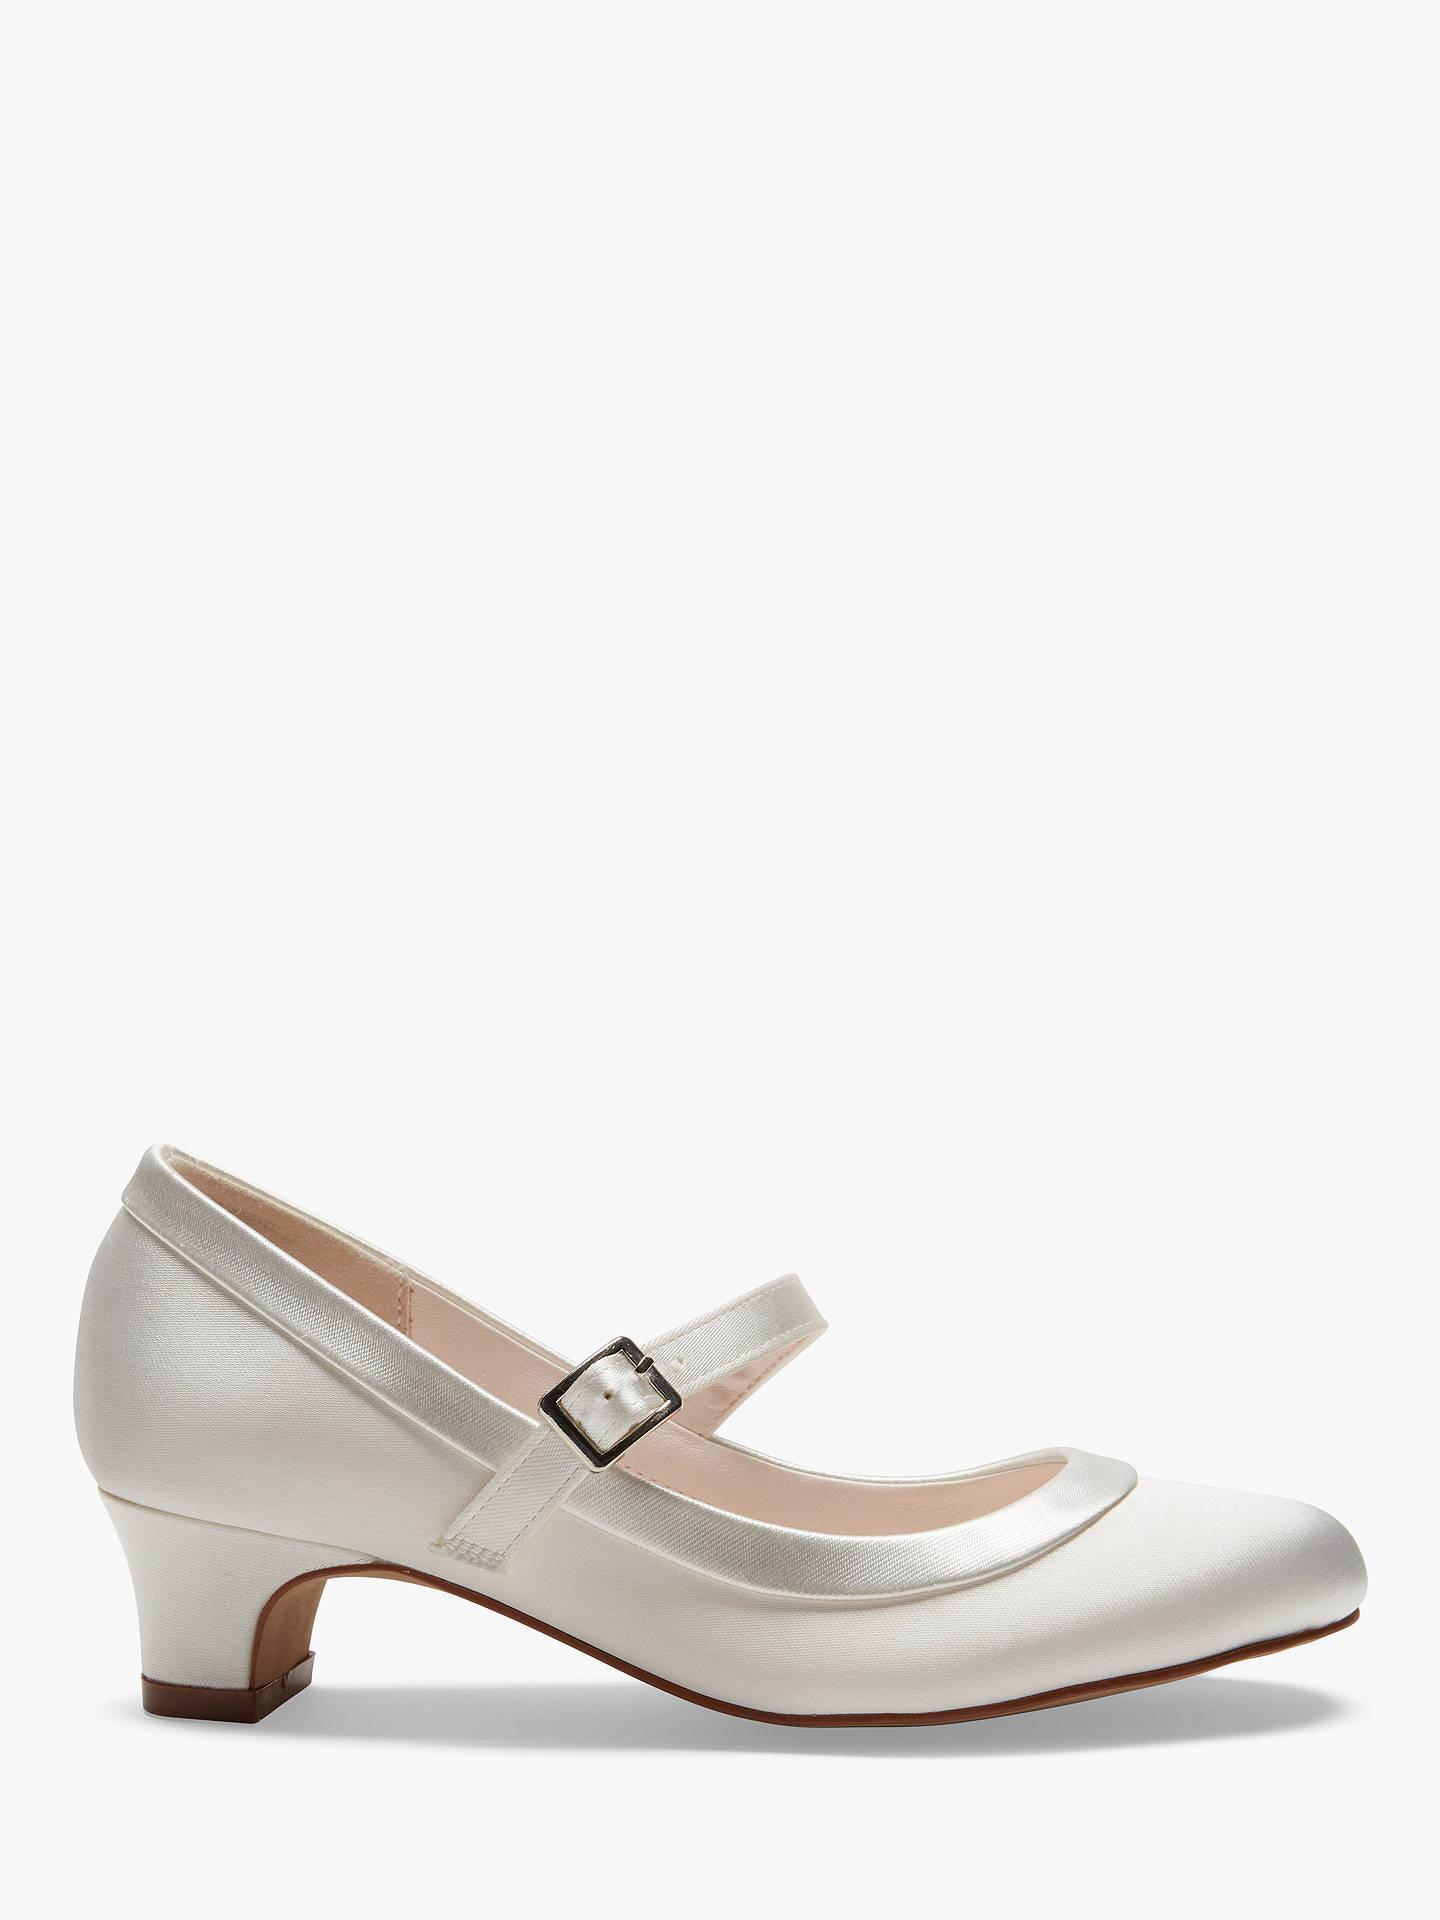 5035bd358b33 Rainbow Club Maisie Bridesmaids  Shoes at John Lewis   Partners